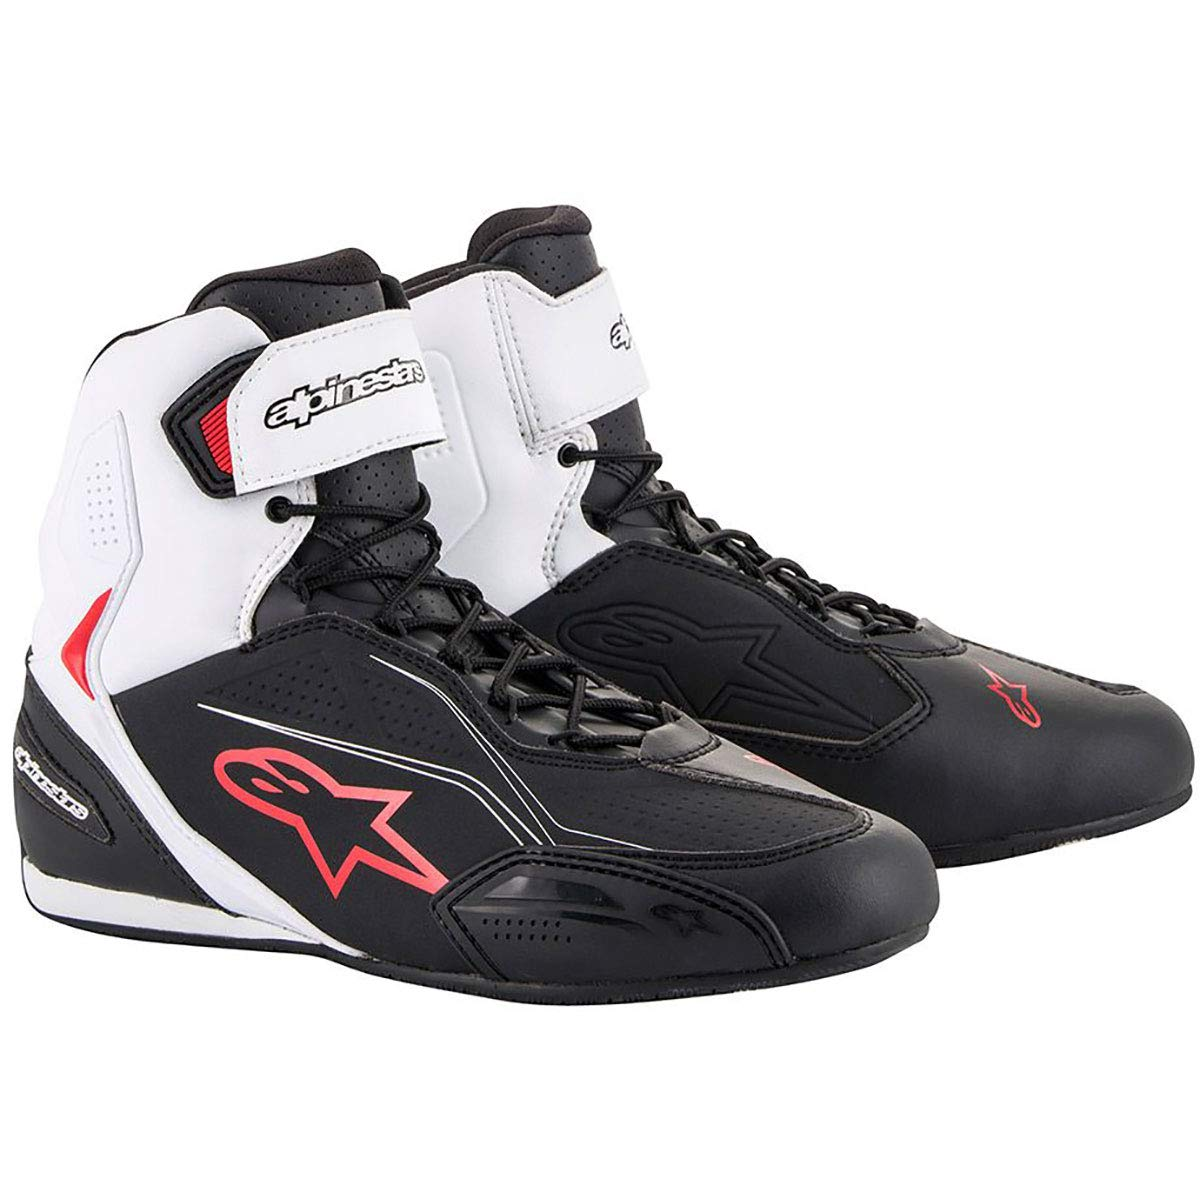 Alpinestars Faster-3 Shoes (7.5, Black/White/Red)